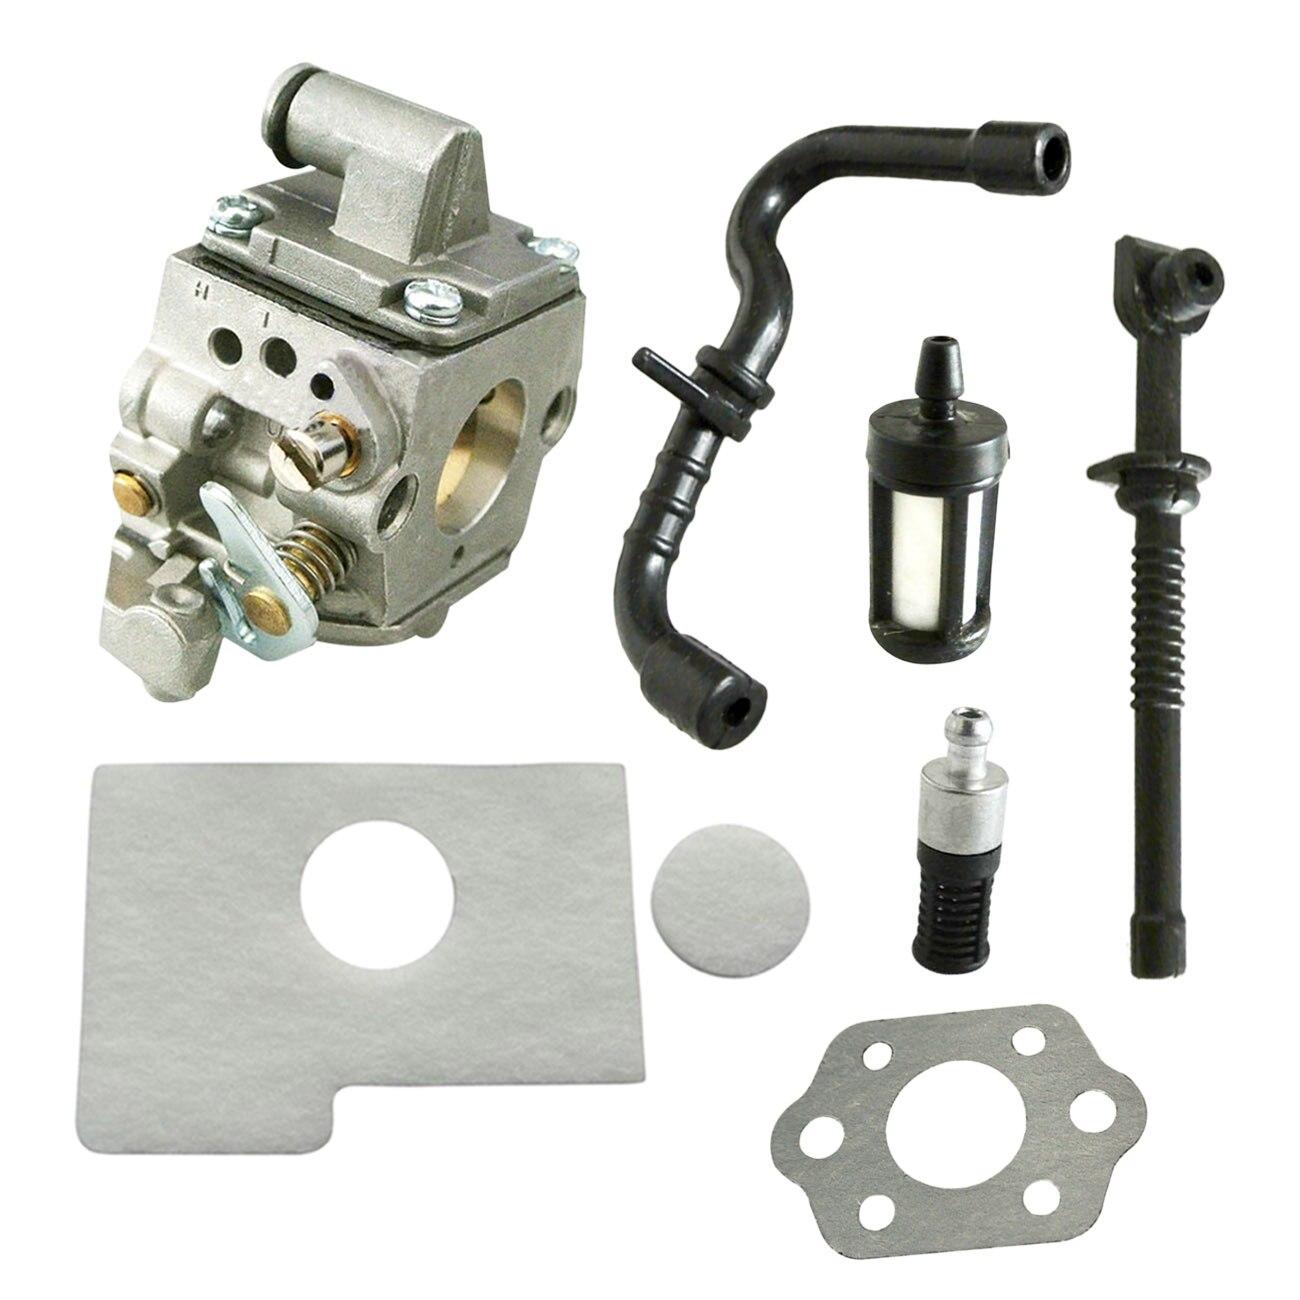 где купить Carburetor W/Gasket Air Filter Fuel Oil Filter Fuel Oil Pipe Spark Plug Kits For Stihl Chainsaw MS170 MS180 дешево